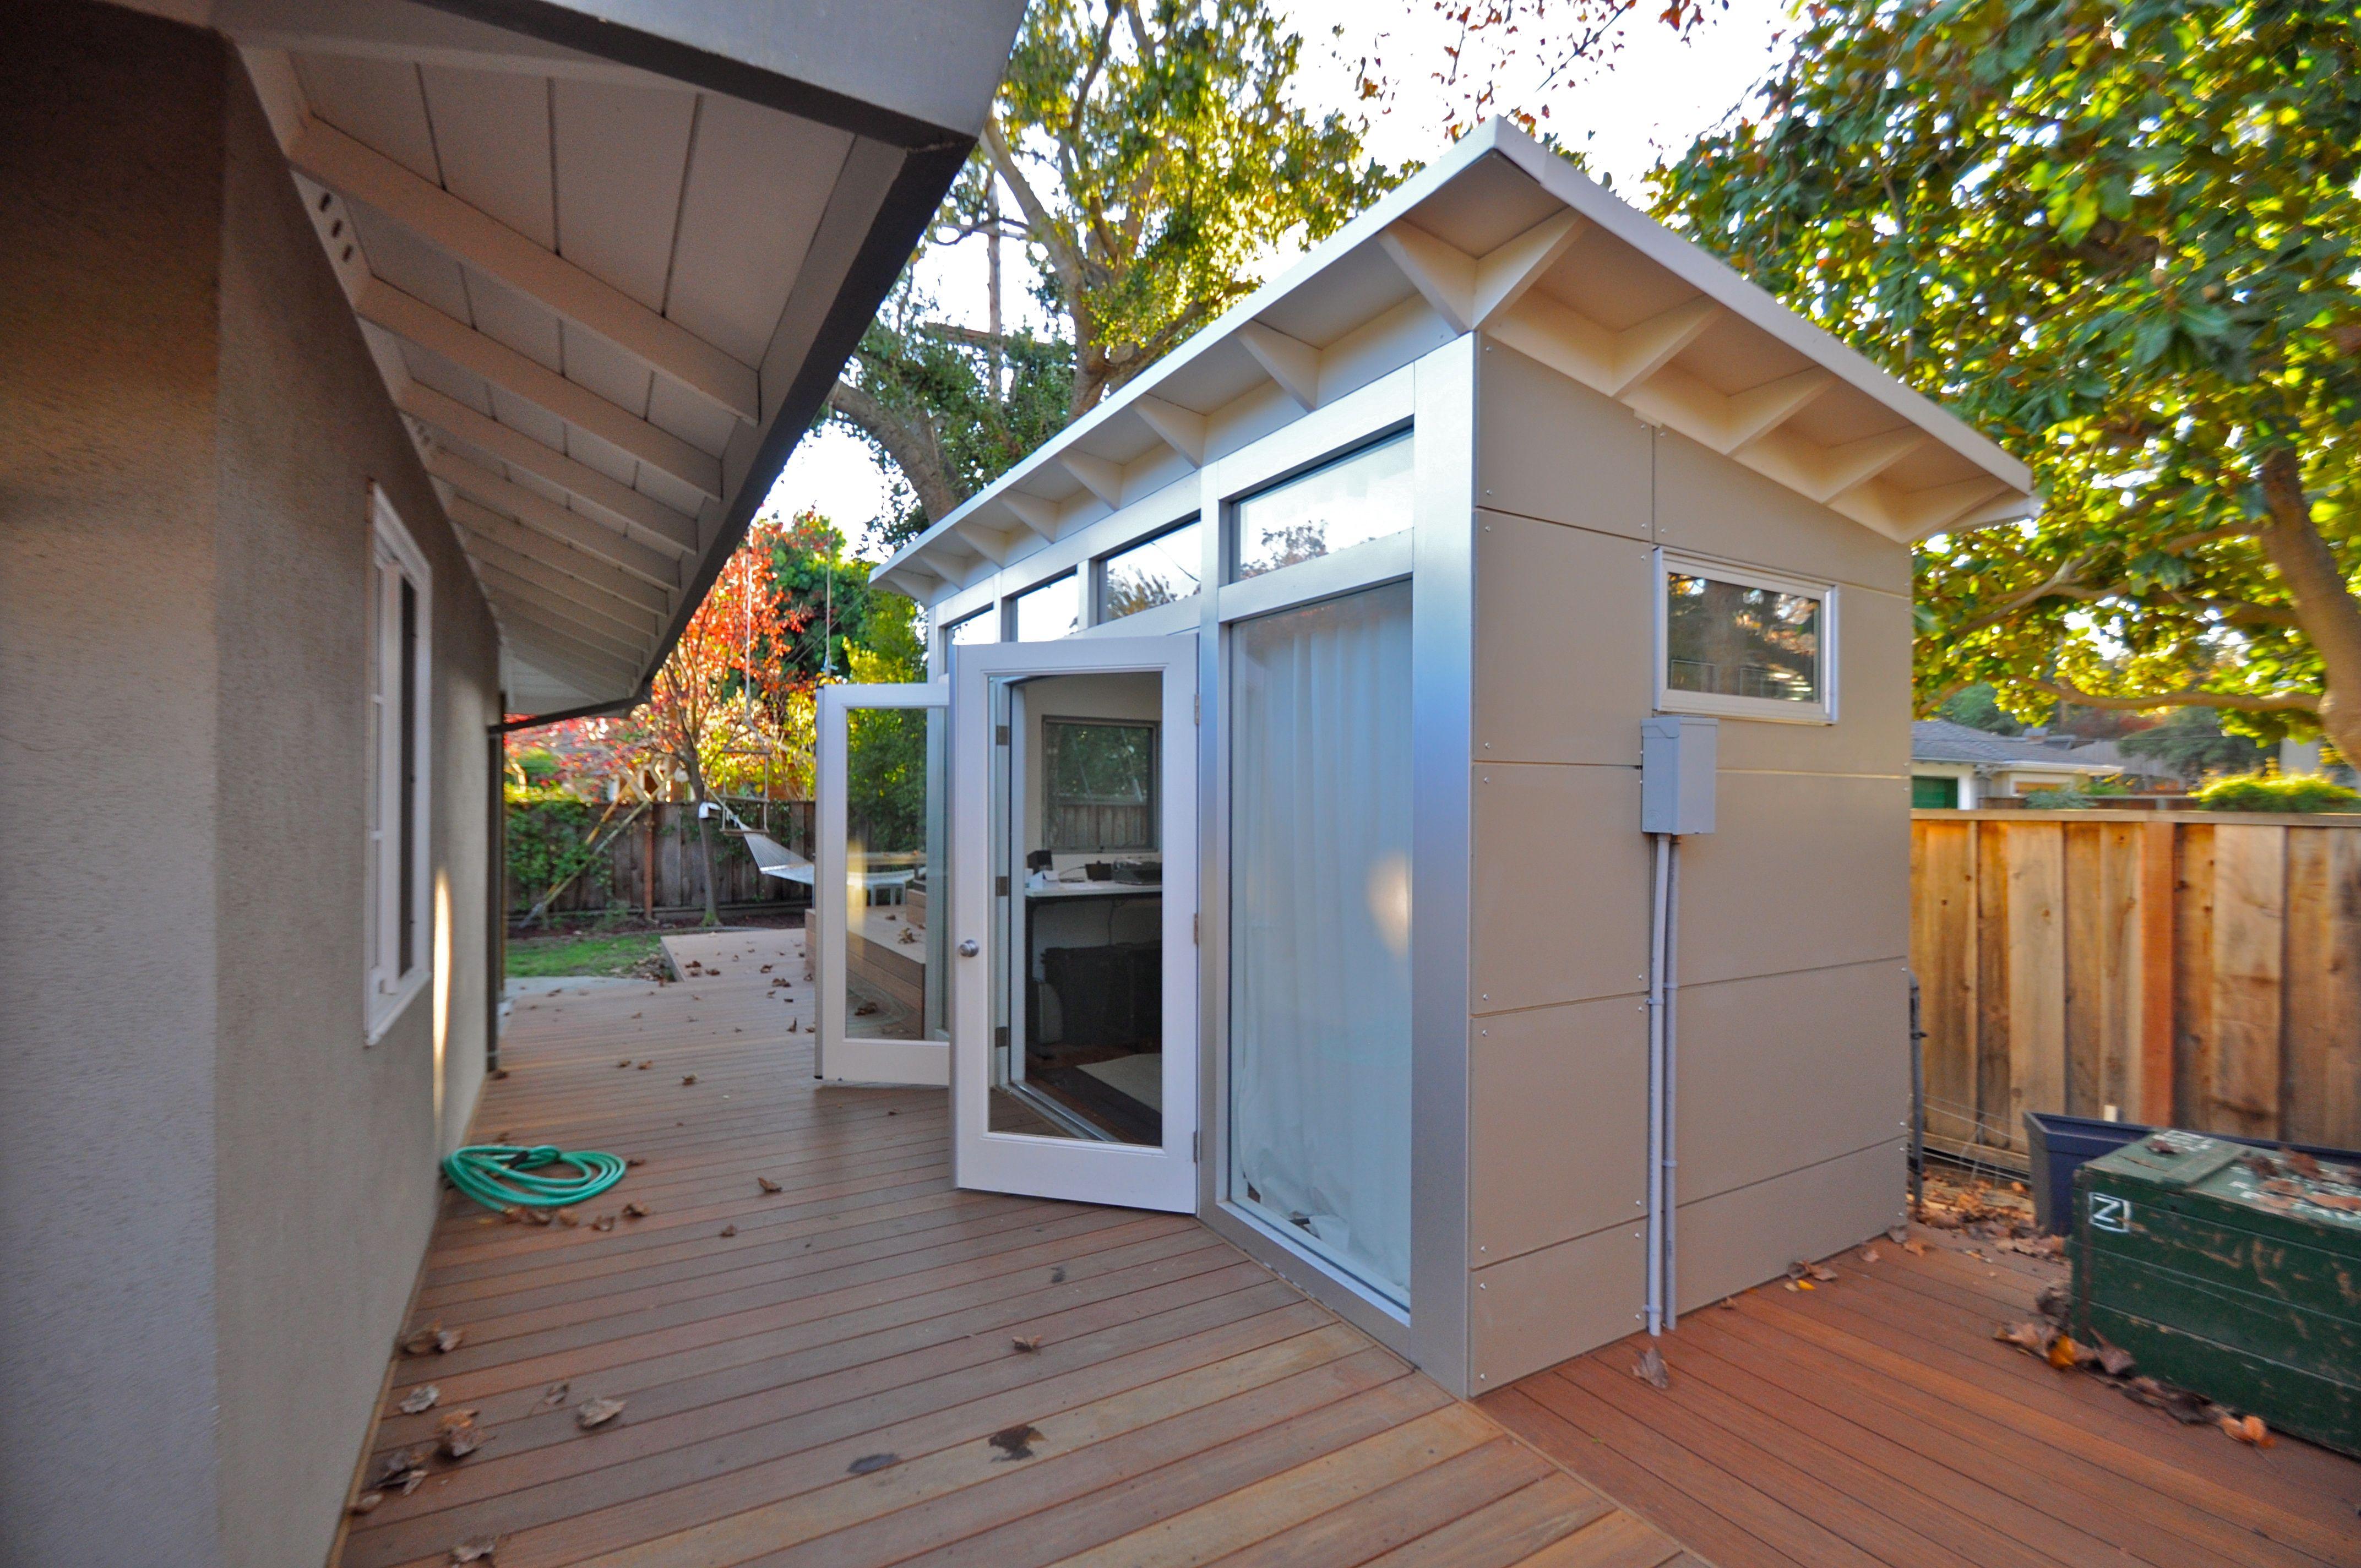 Enjoyable 17 Best Images About Backyard Studio Ideas On Pinterest Backyard Largest Home Design Picture Inspirations Pitcheantrous